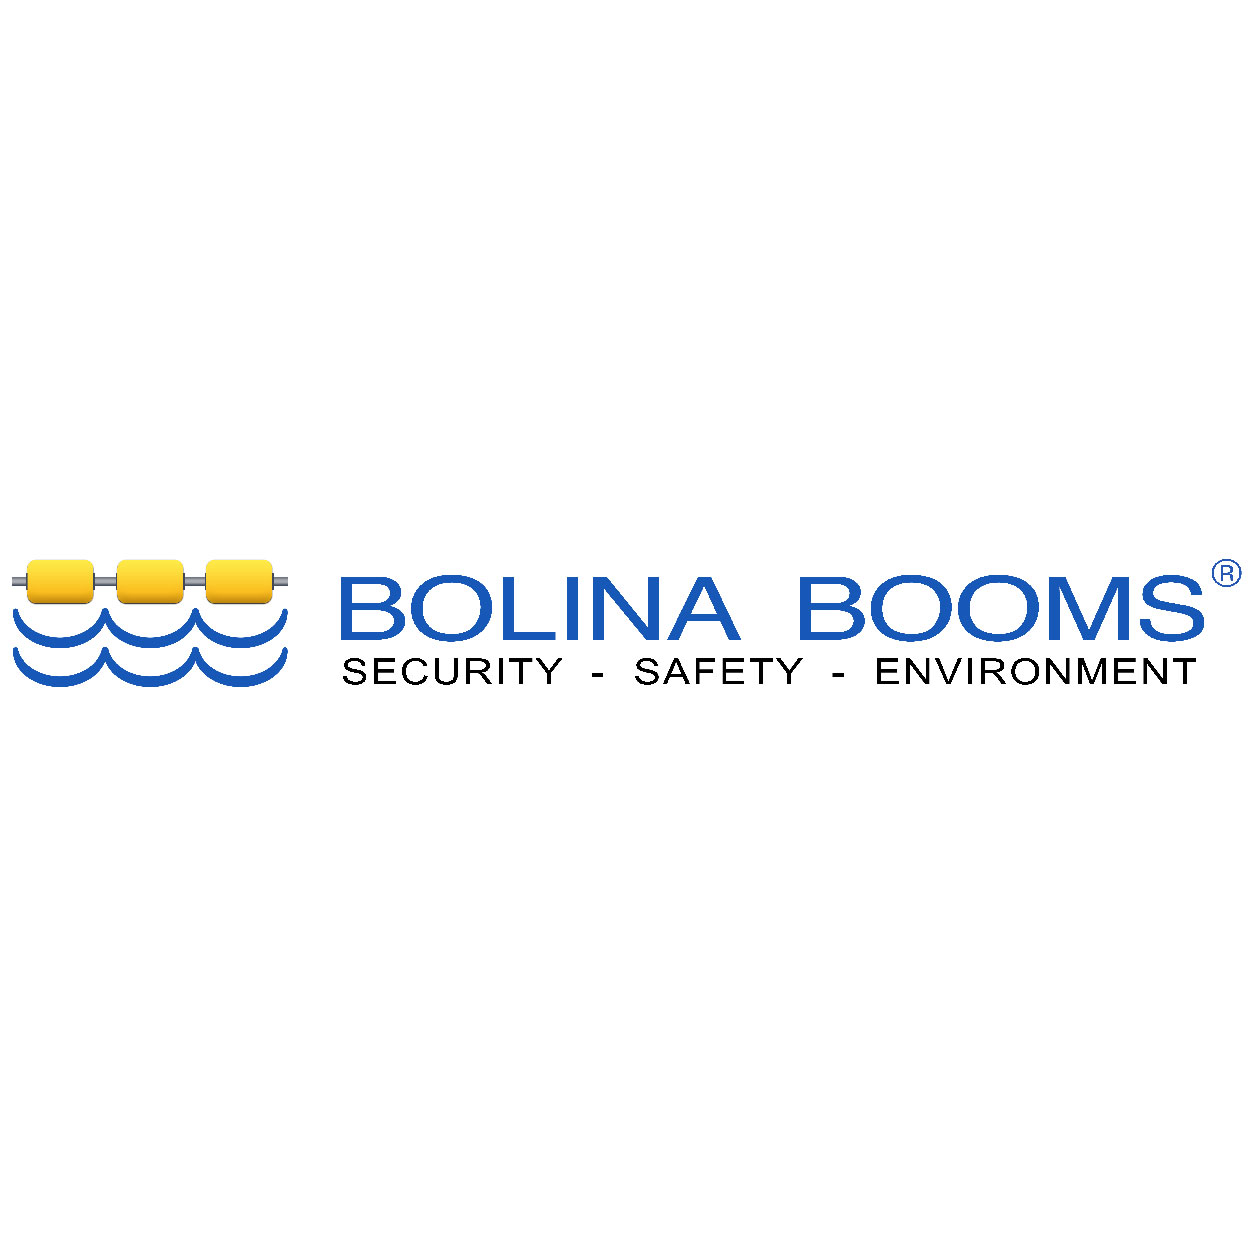 Bolina Booms, an Ecocoast Brand